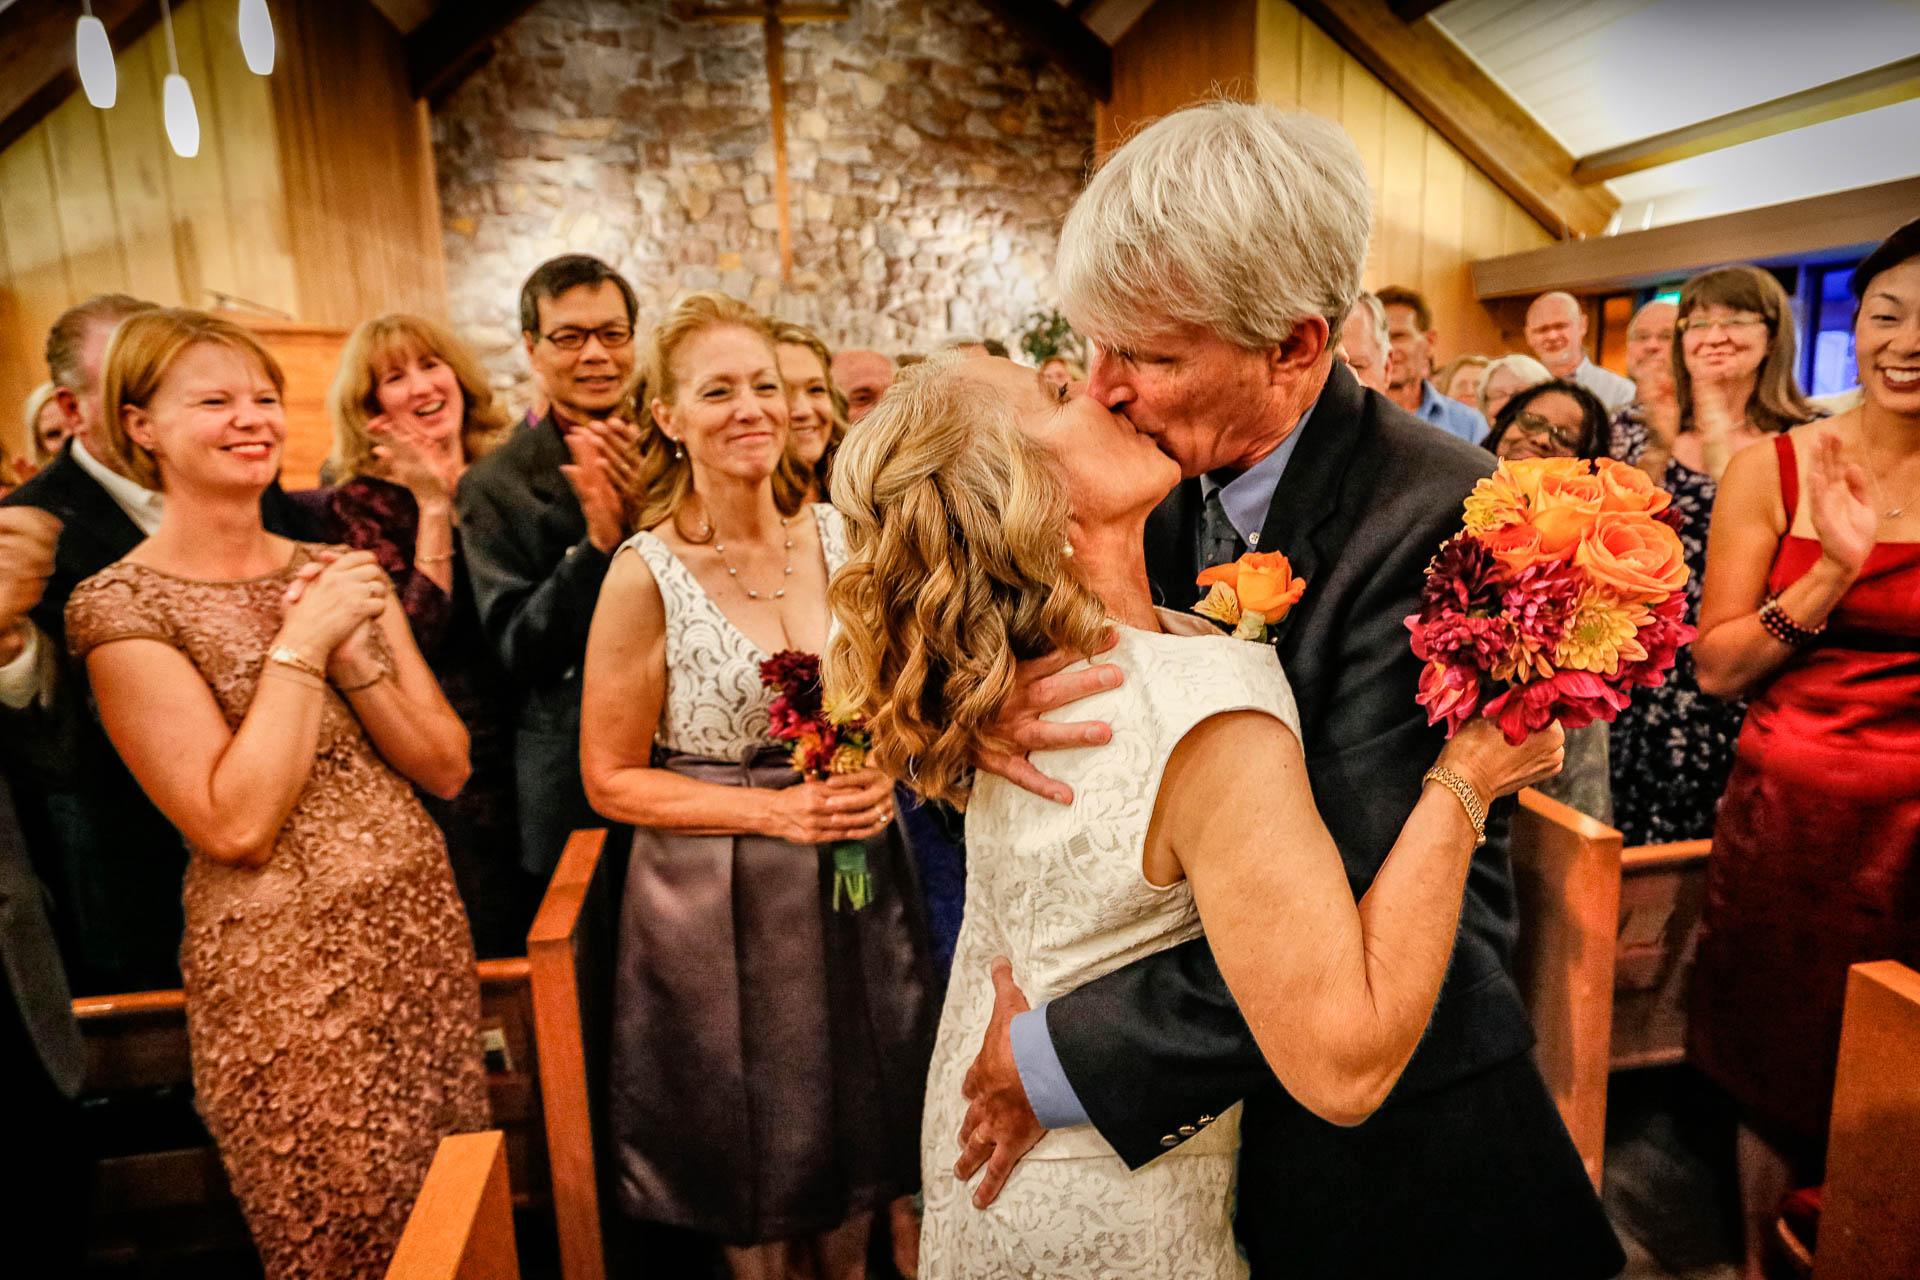 WEDDING-Karen-Mark-28Sep2014-MTO0289-Edit-Edit.jpg